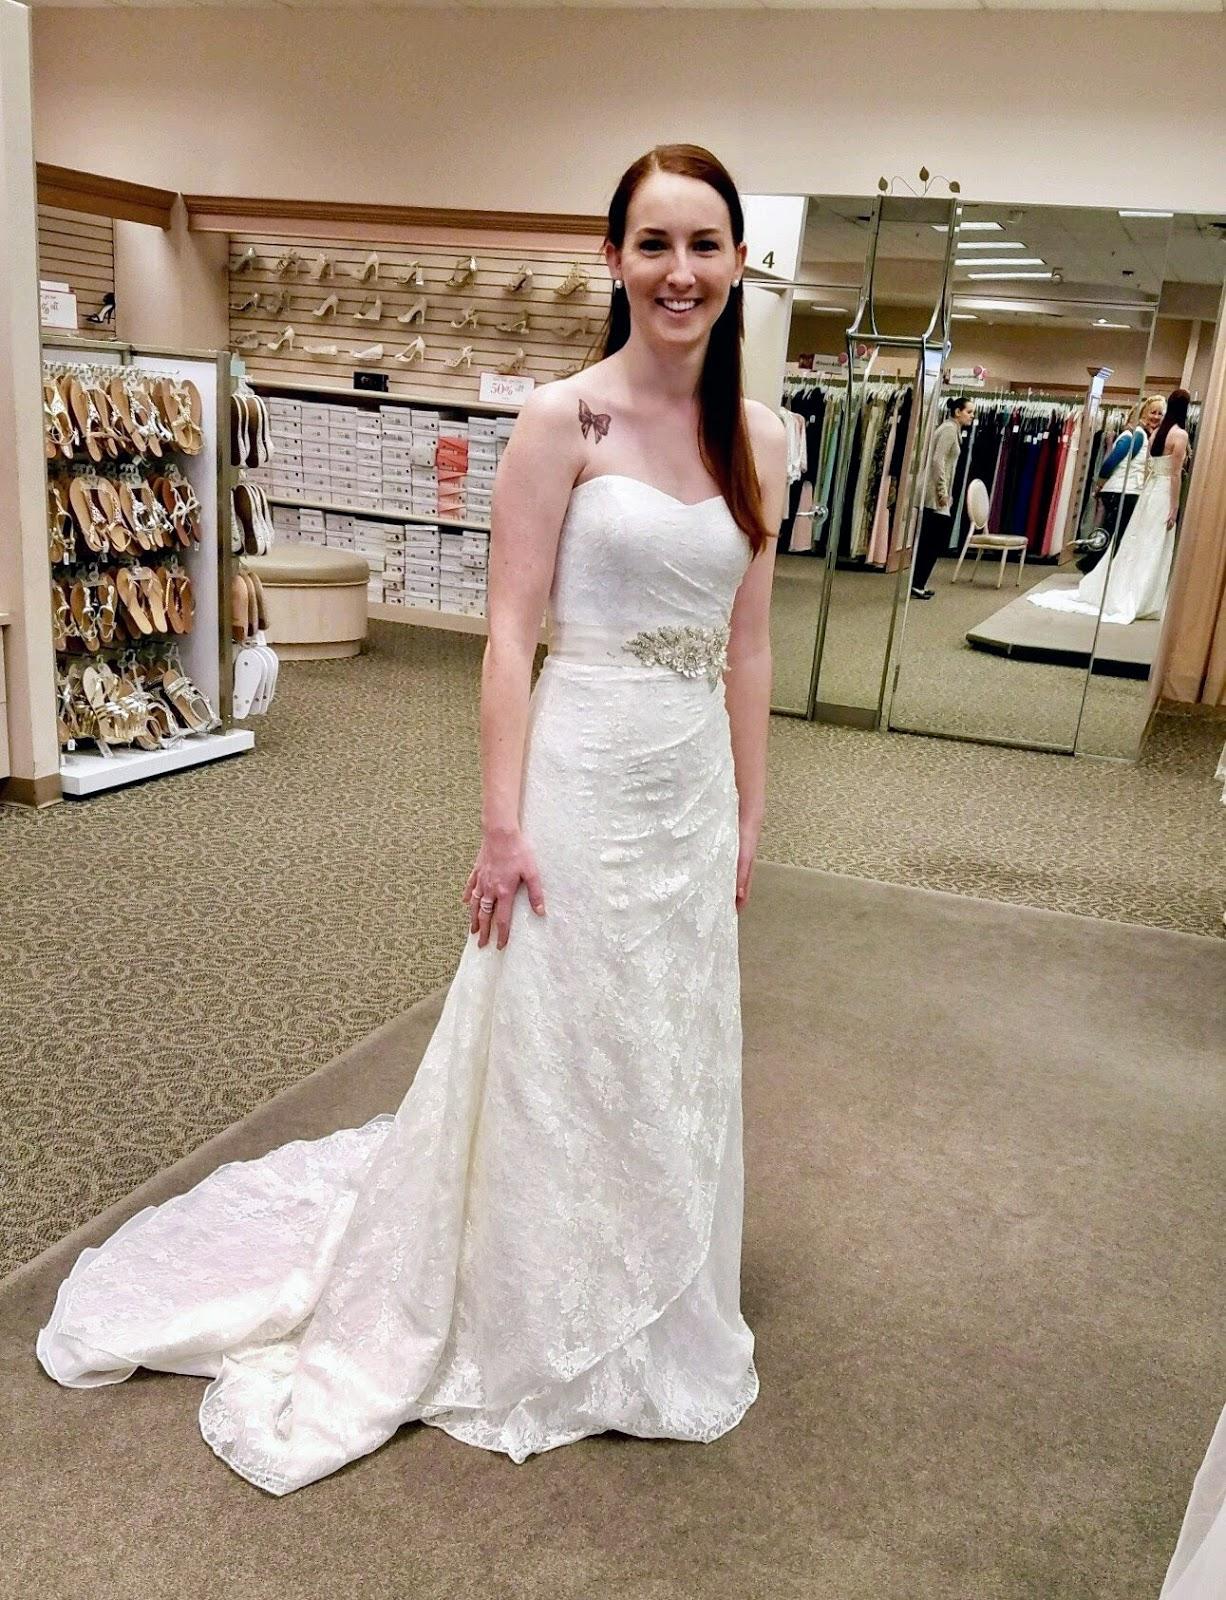 Beloved Blog Ideas For Wedding Dress Shopping Day,Mother Of The Groom Beach Wedding Dress